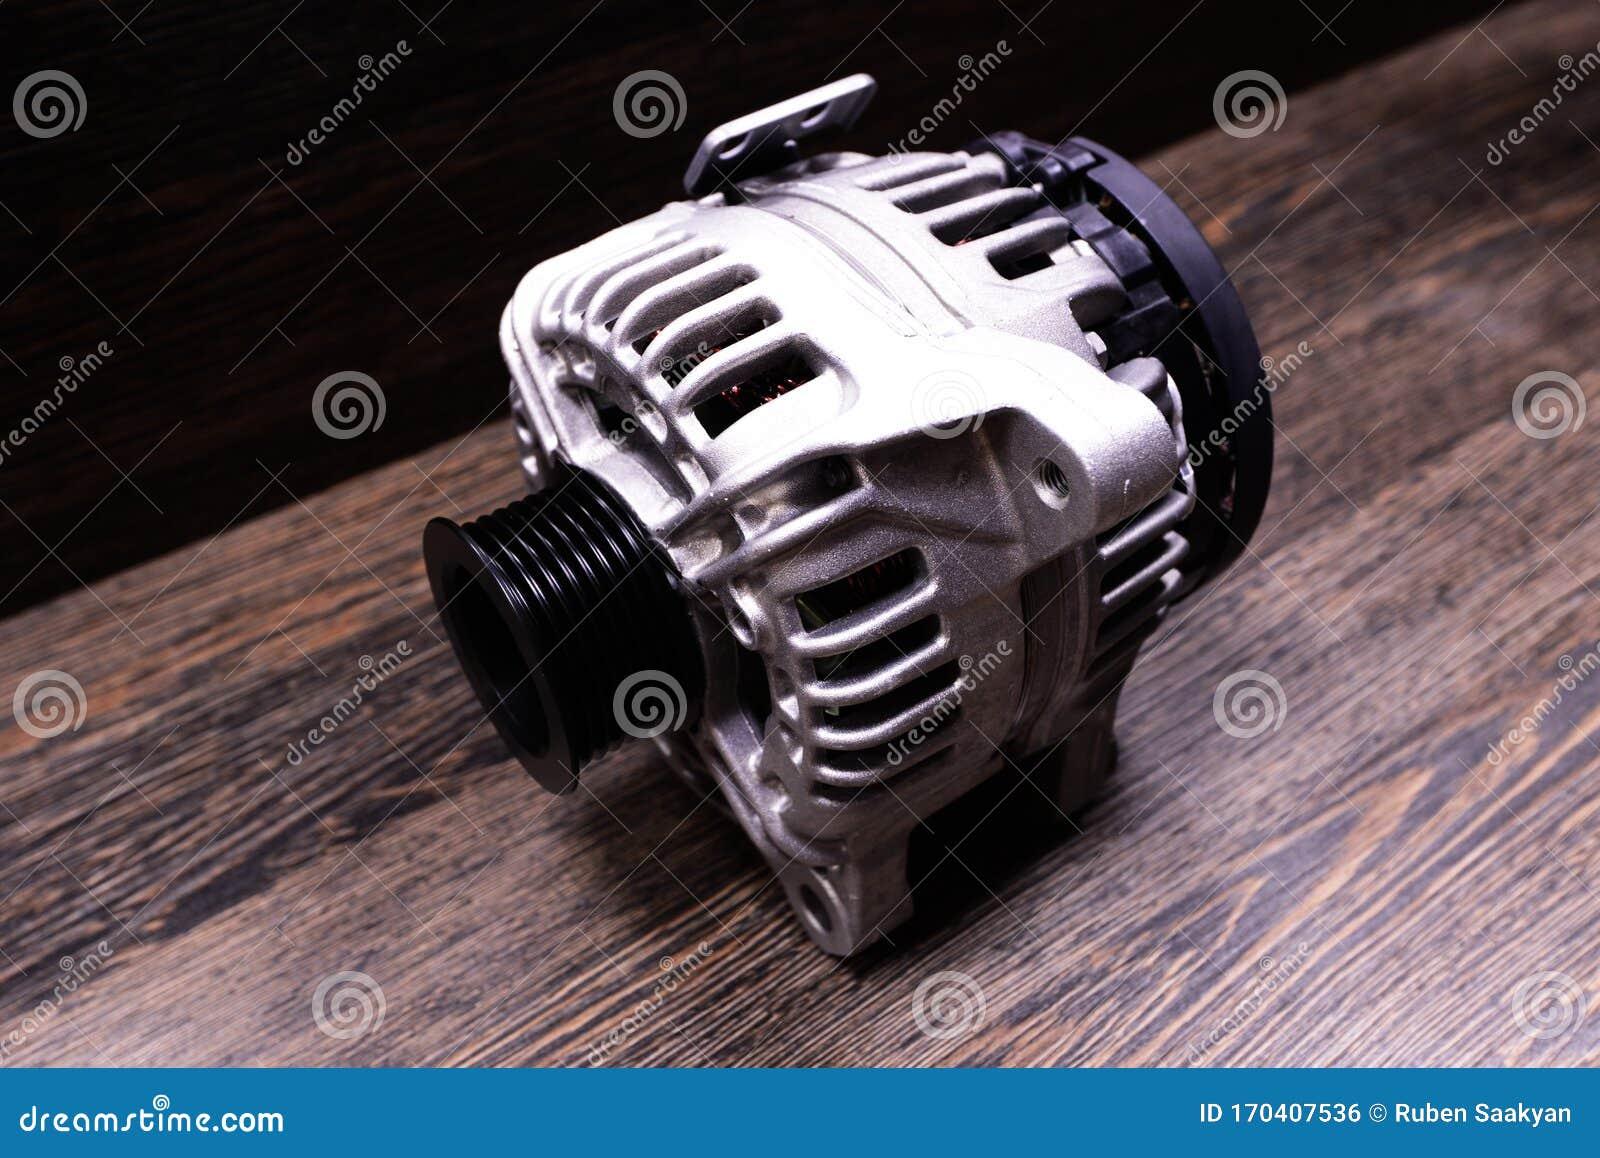 Car Alternator On Wooden Background Stock Photo Image Of Background Alternator 170407536